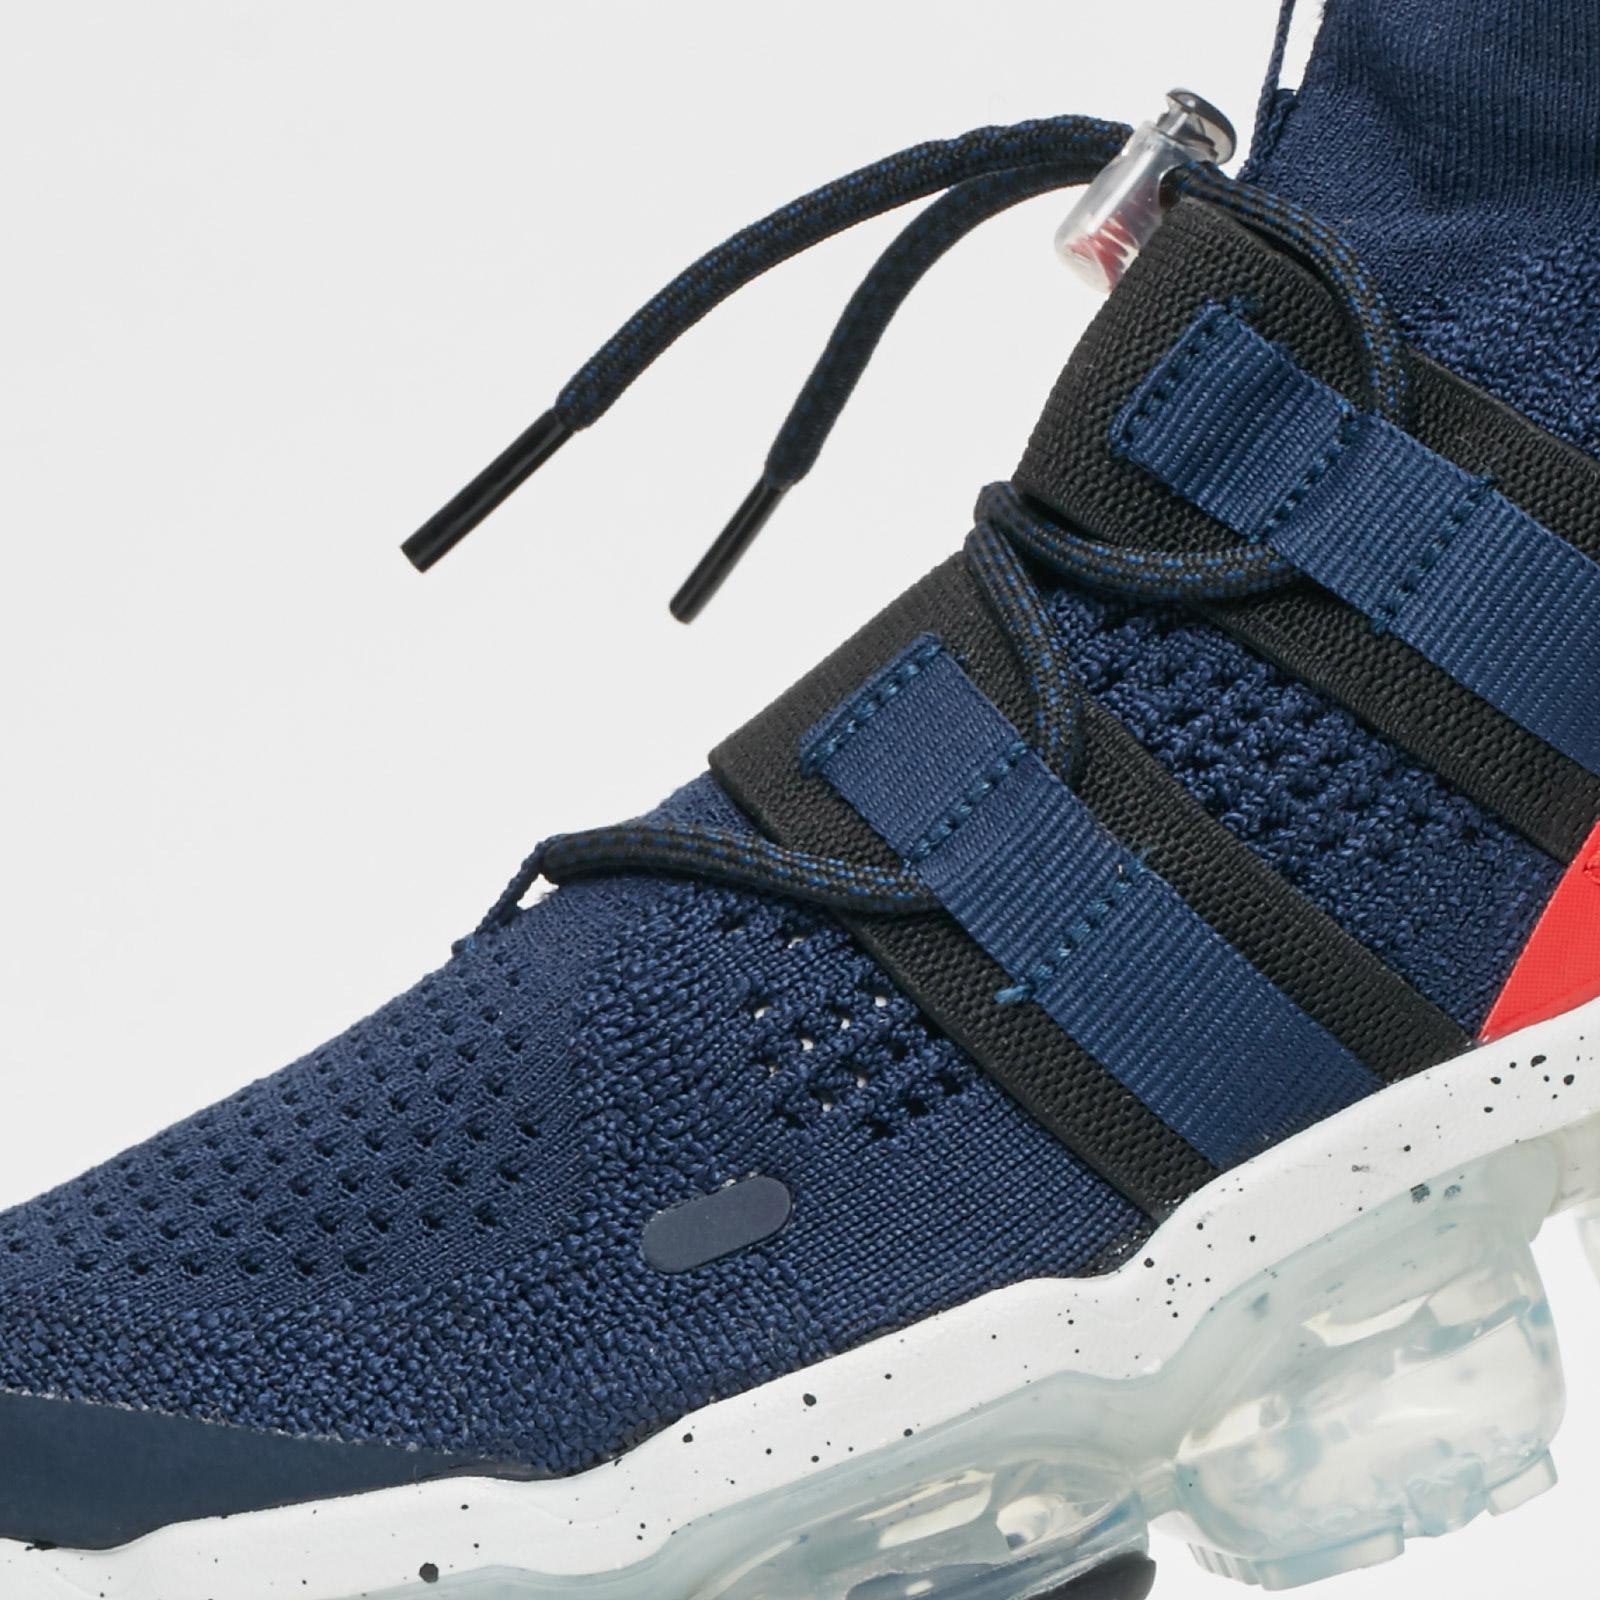 6bd76acc2b7 Nike Air Vapormax FK Utility - Ah6834-406 - Sneakersnstuff ...